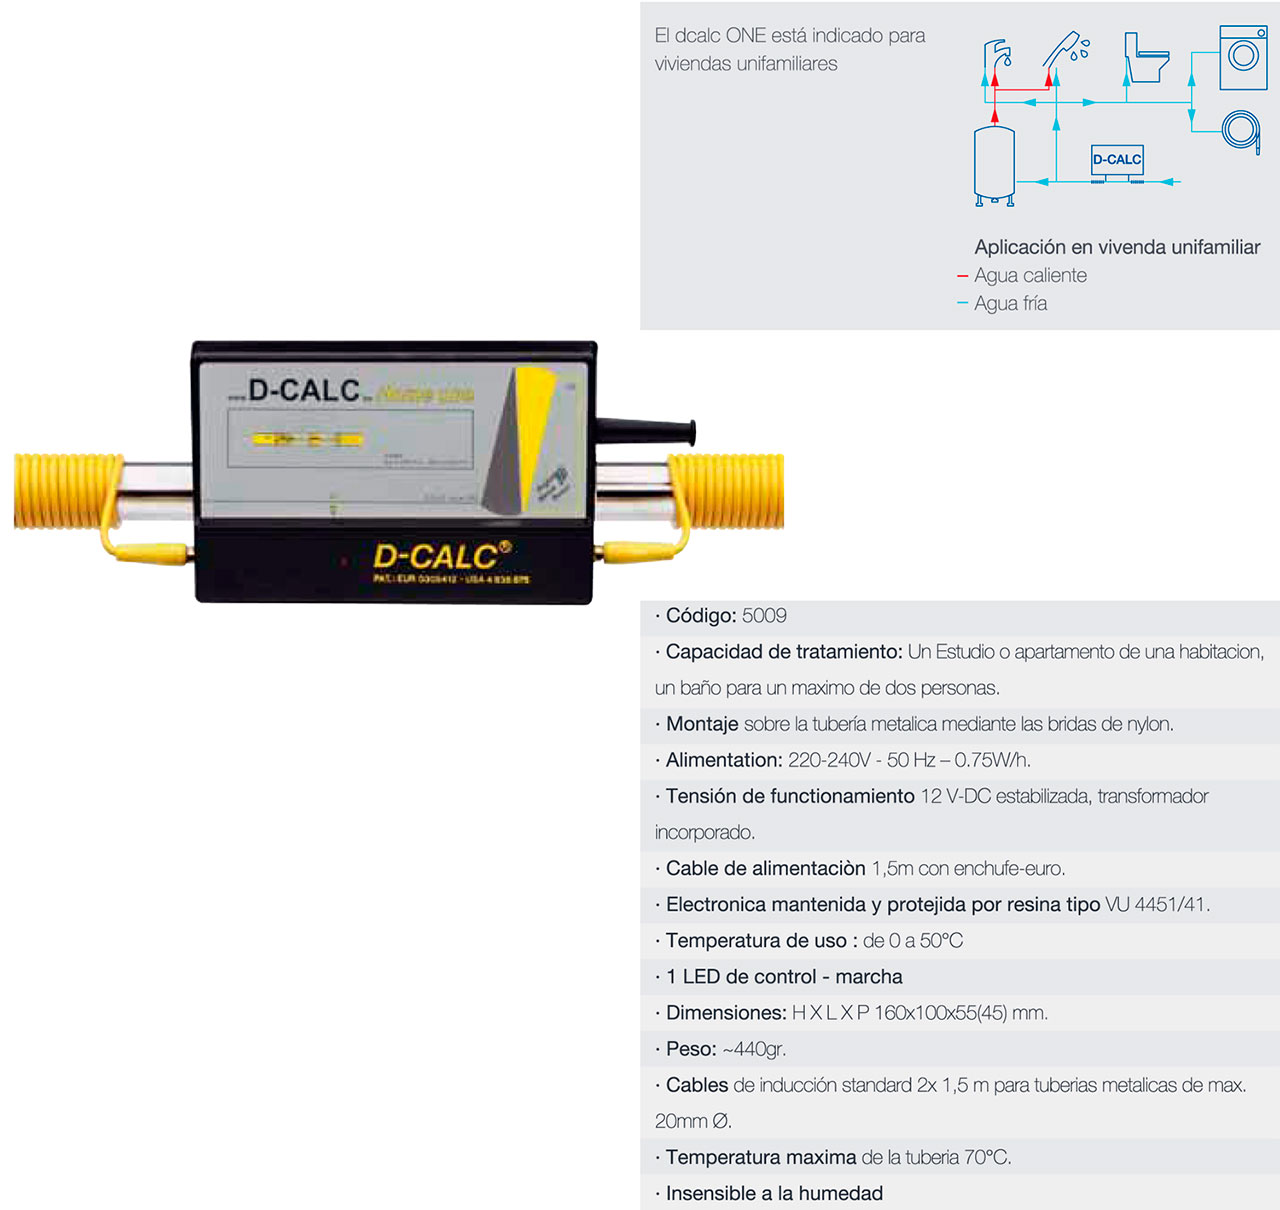 D-CALC ONE - Desincrustador calcareo doméstico